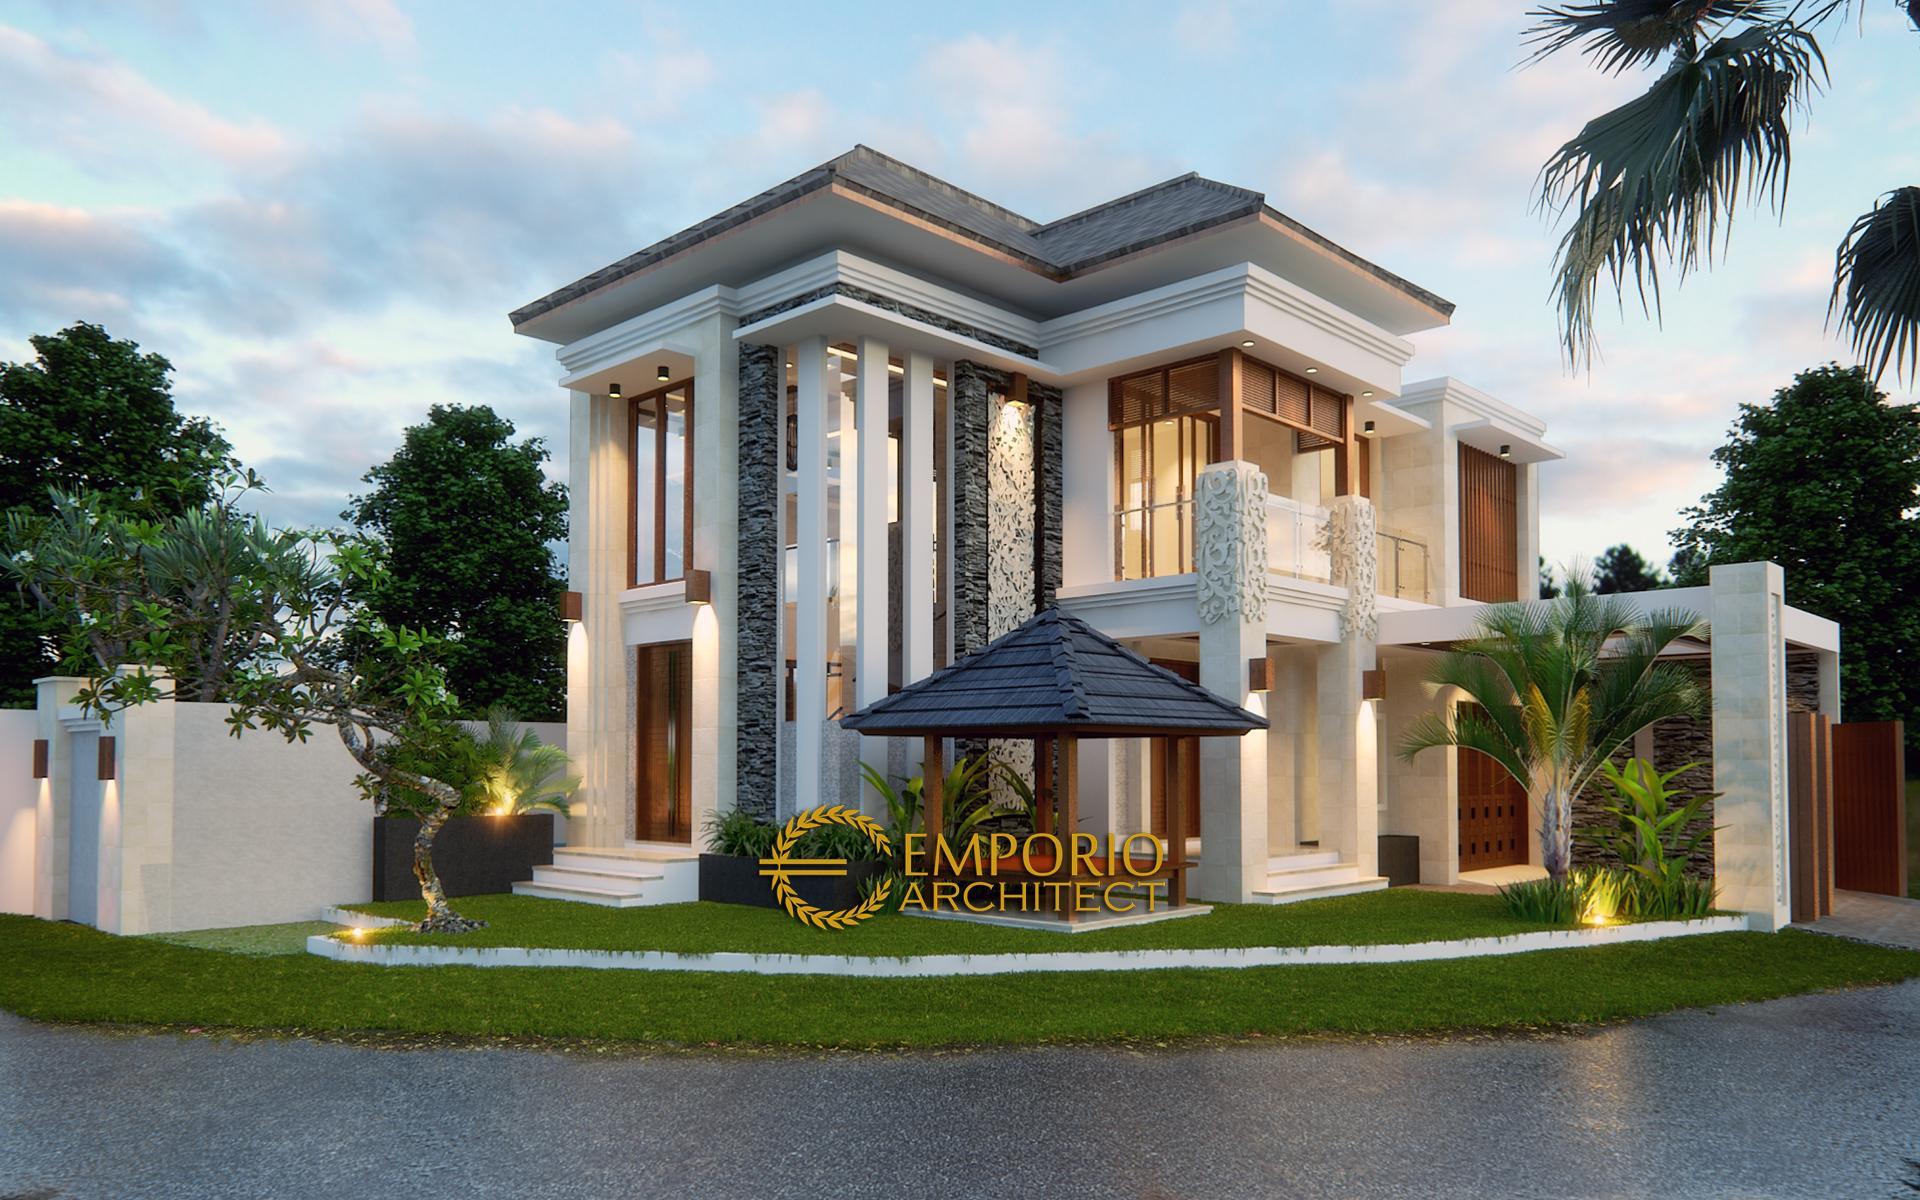 Mr. Adit Brata Villa Bali House 2 Floors Design II - Jakarta